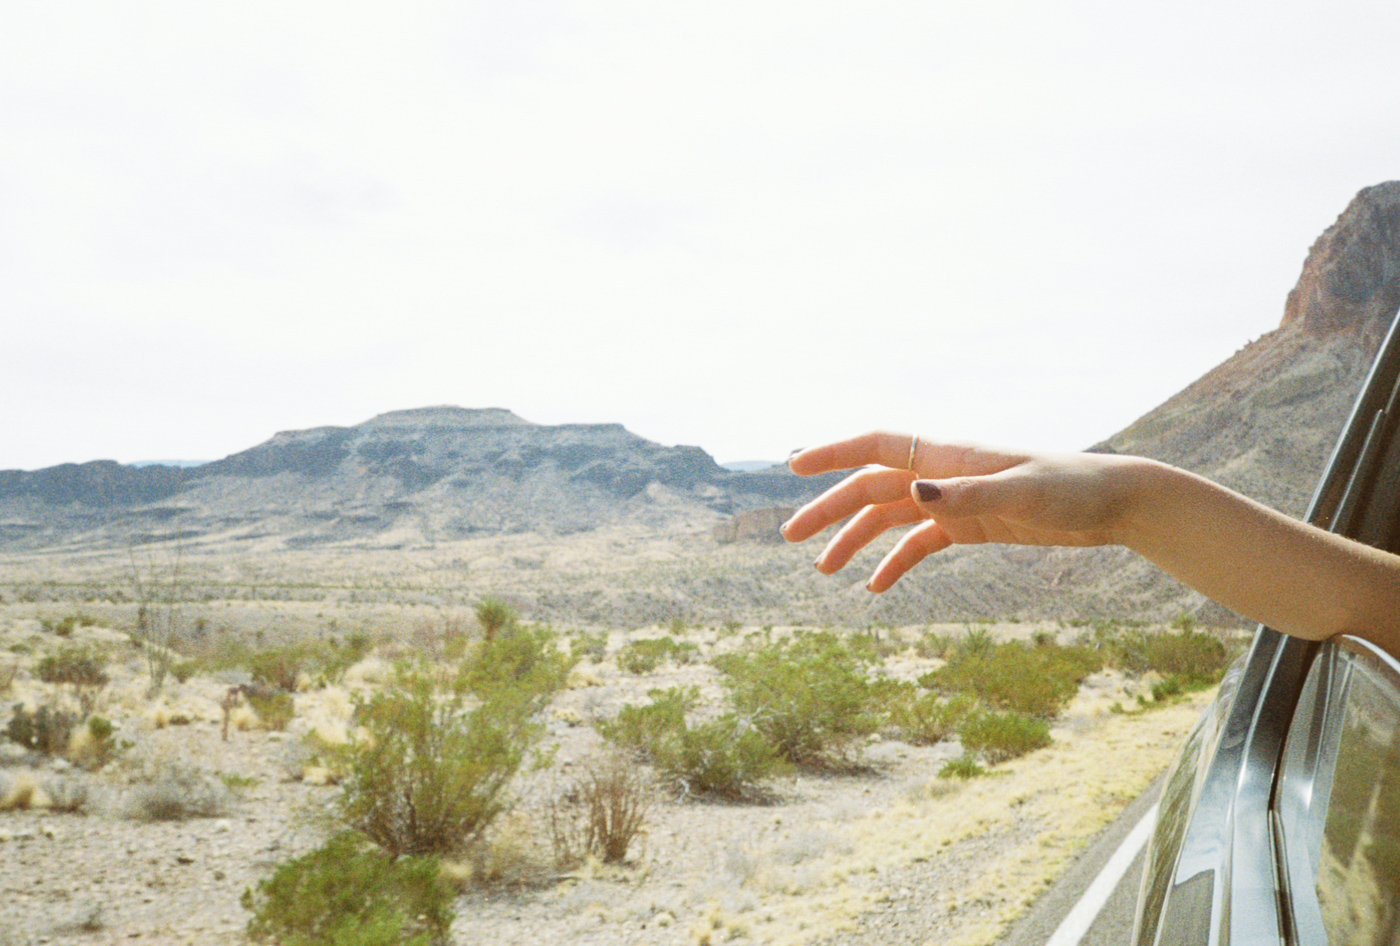 film 35mm lomo olympus hike camp big bend texas america yall pawlowski hand